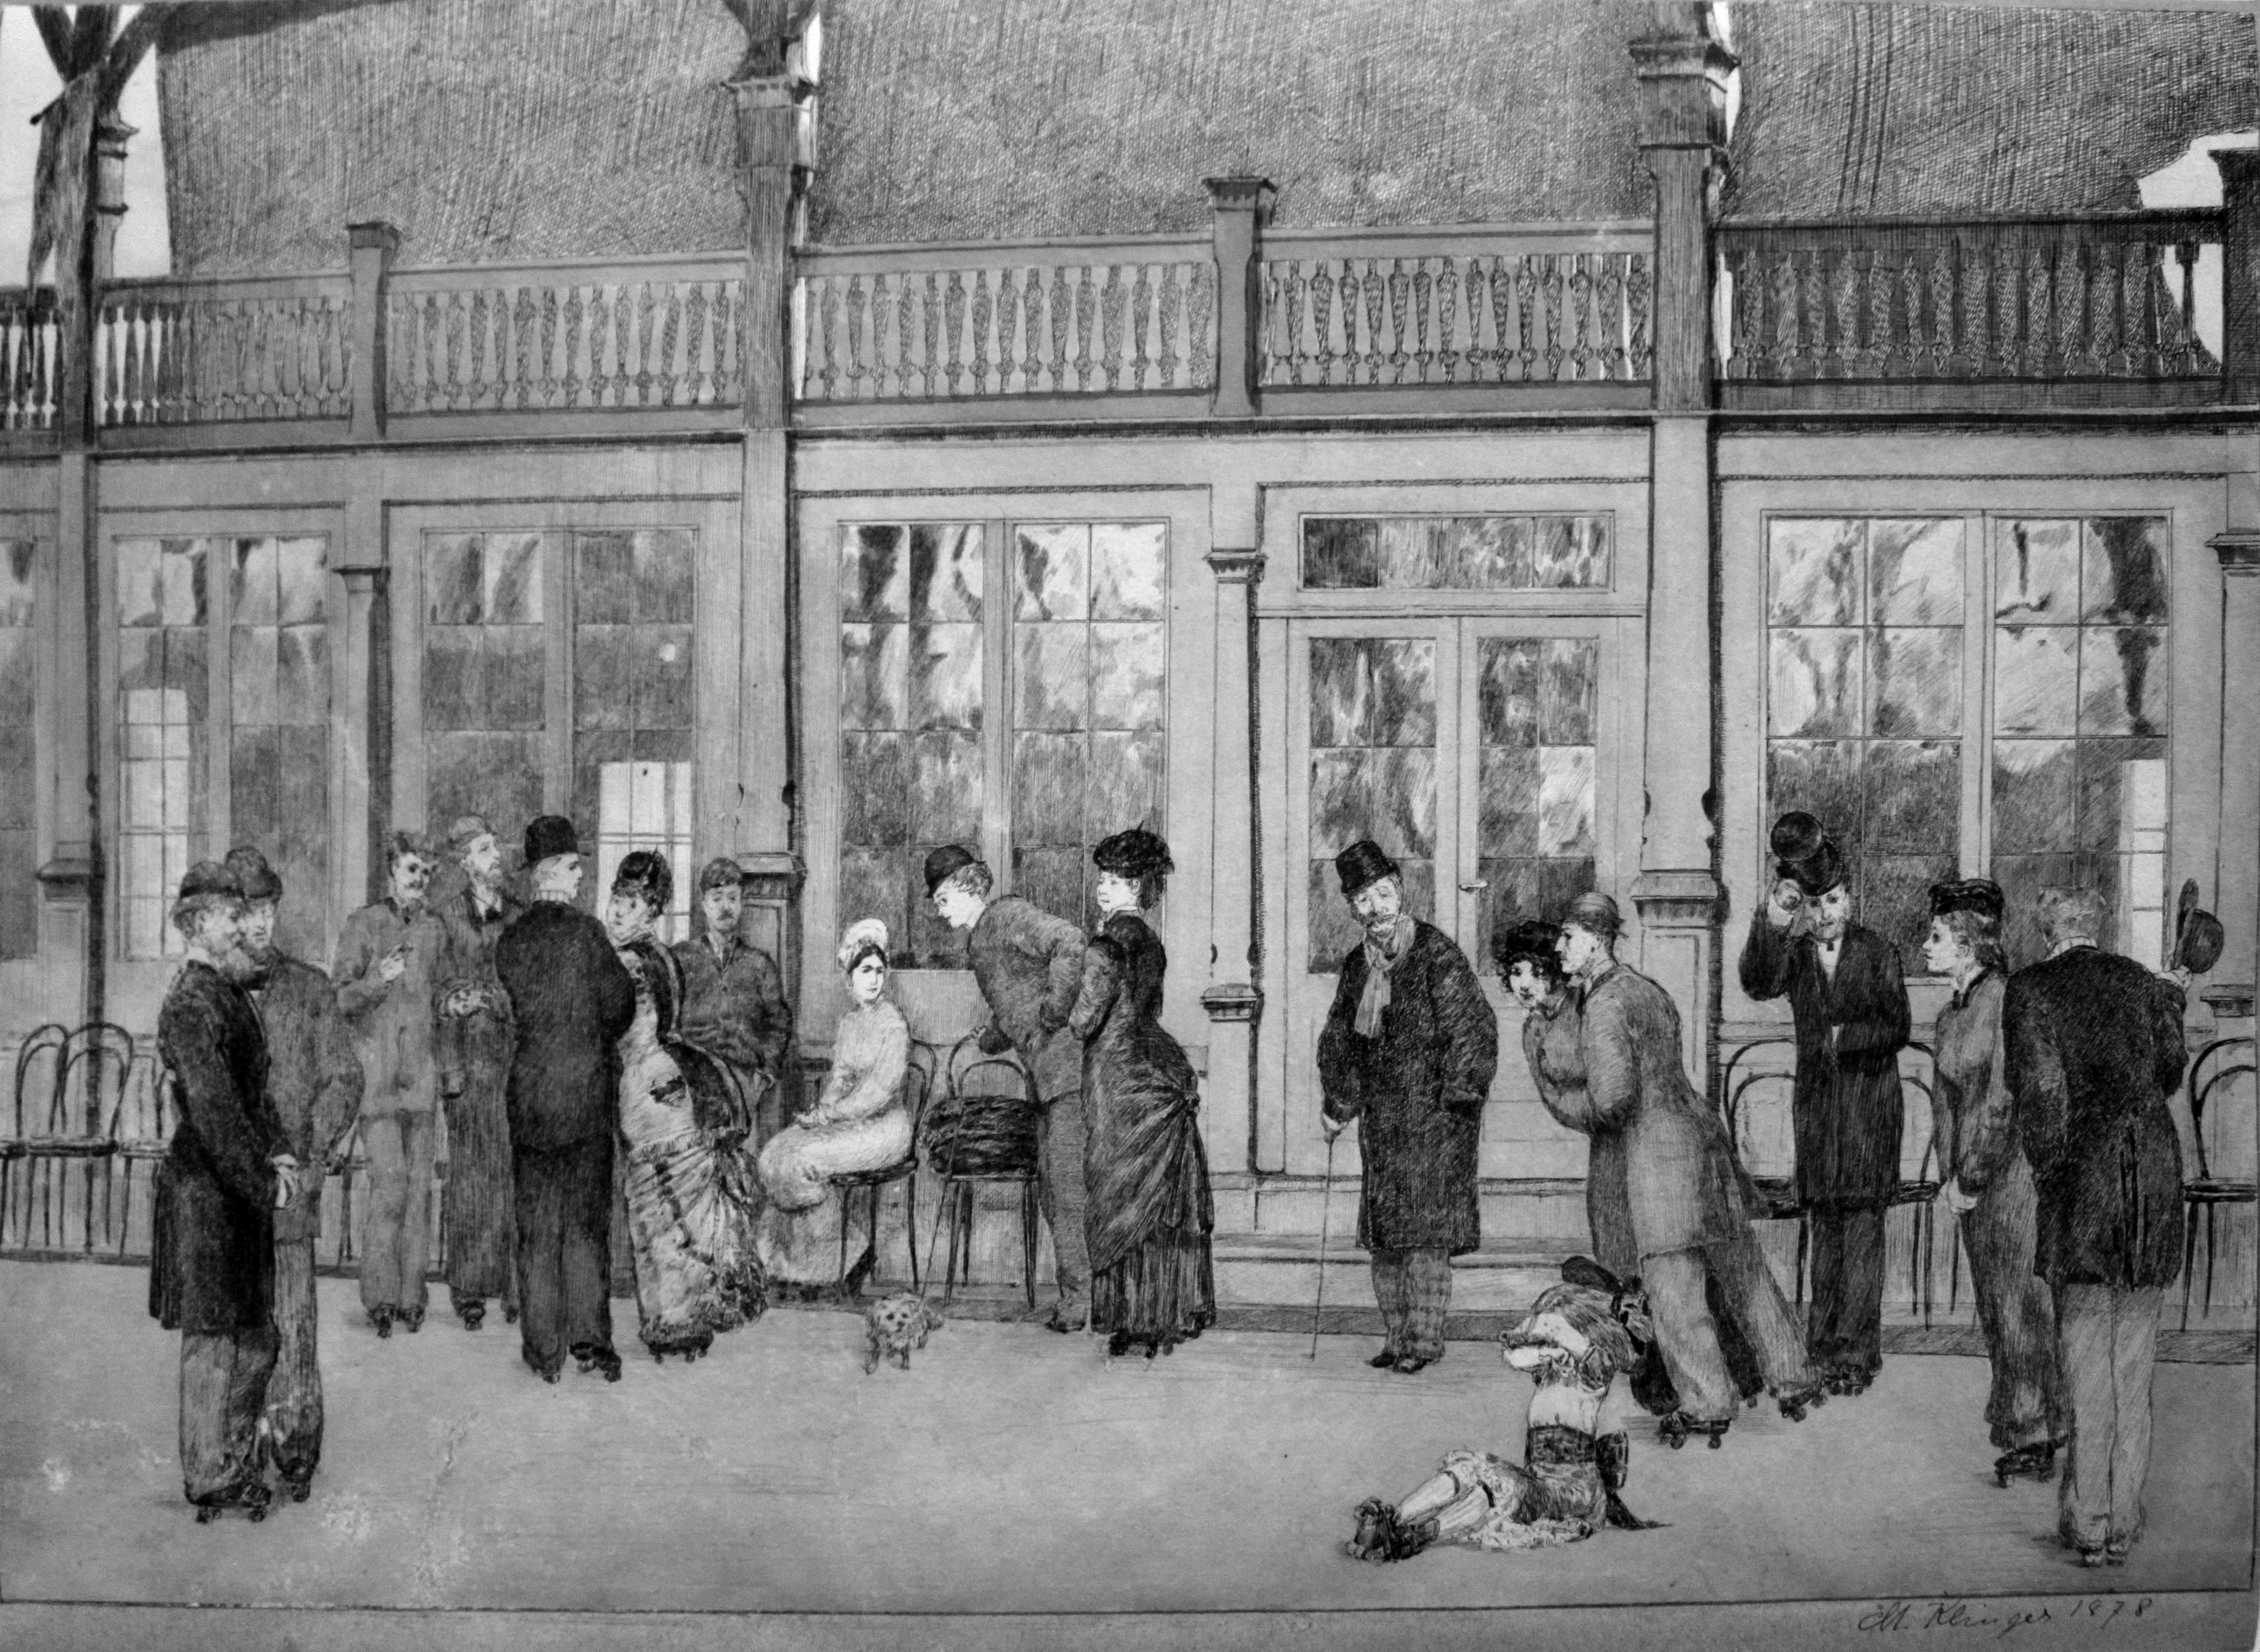 File:1878 Klinger Handschuh 01 Ort anagoria.JPG - Wikimedia Commons